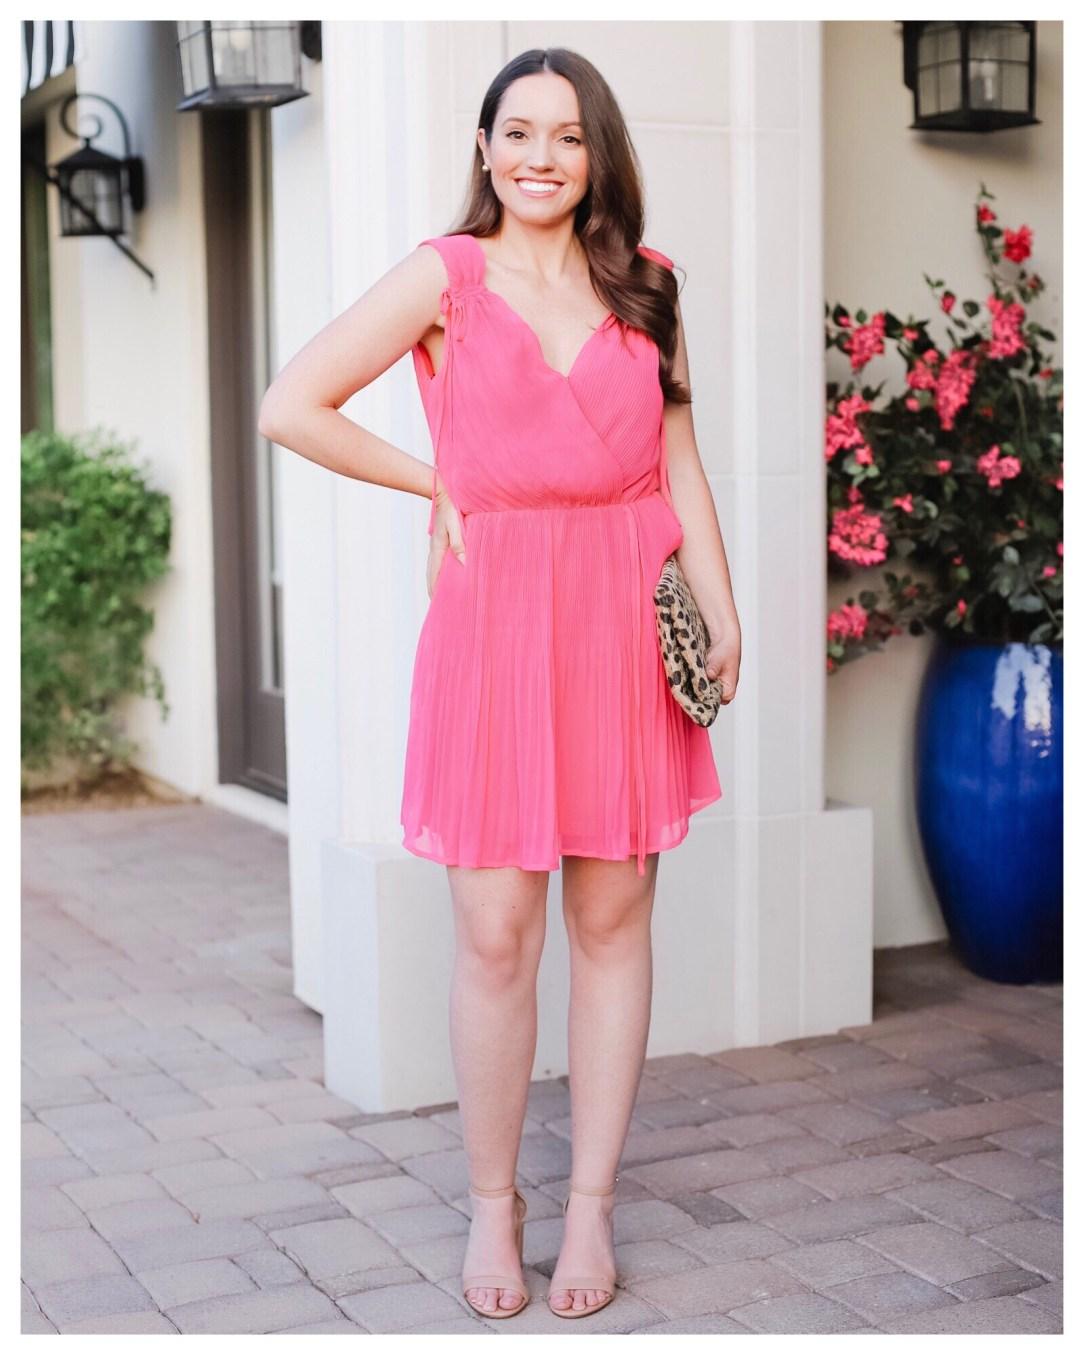 Five Foot Feminine in Dress Up Buttercup Plus One Minidress